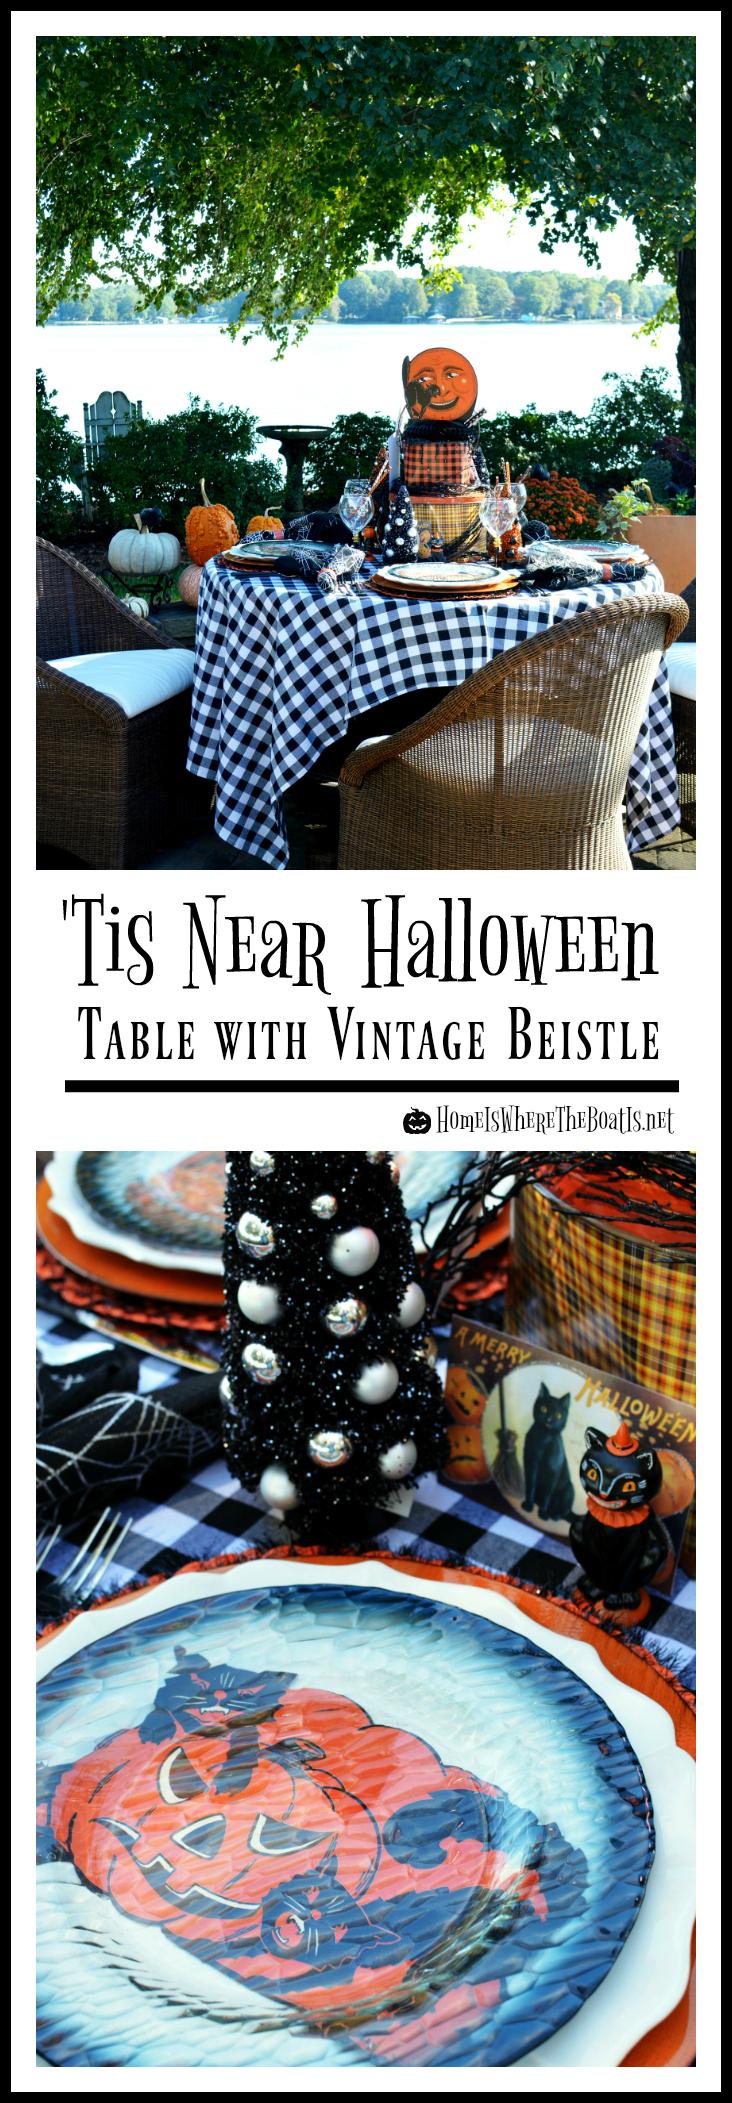 Vintage Beistle Halloween Table | ©homeiswheretheboatis.net #Halloween #Beistle #tablescape #alfresco